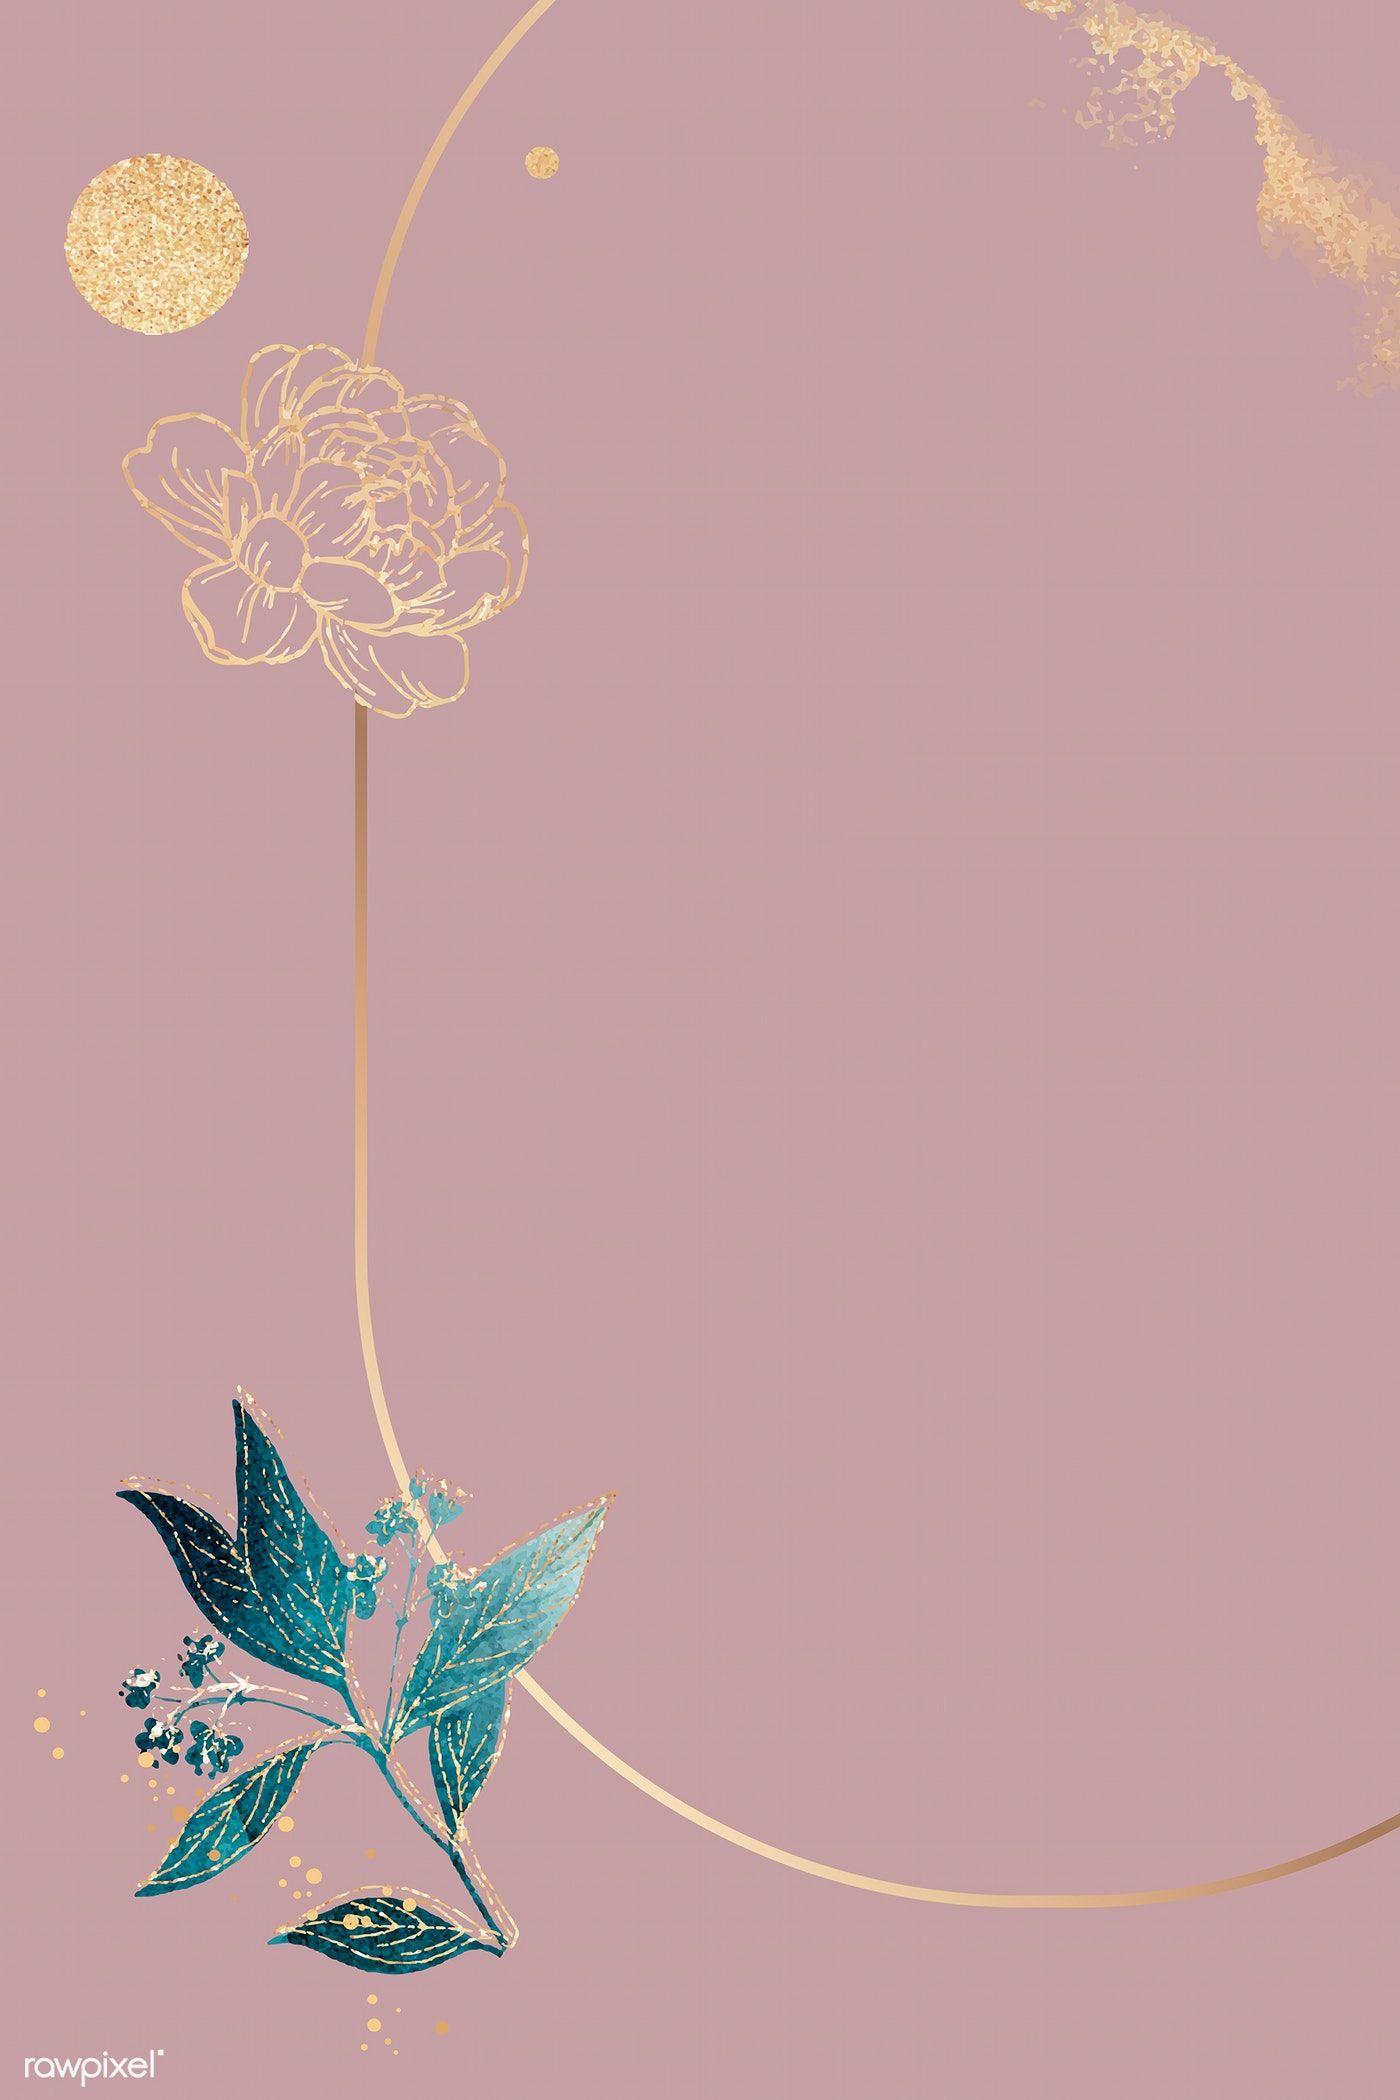 Download Premium Vector Of Blank Pink Oval Floral Card Vector 1211902 Blank Pink Floral Border Design Floral Cards